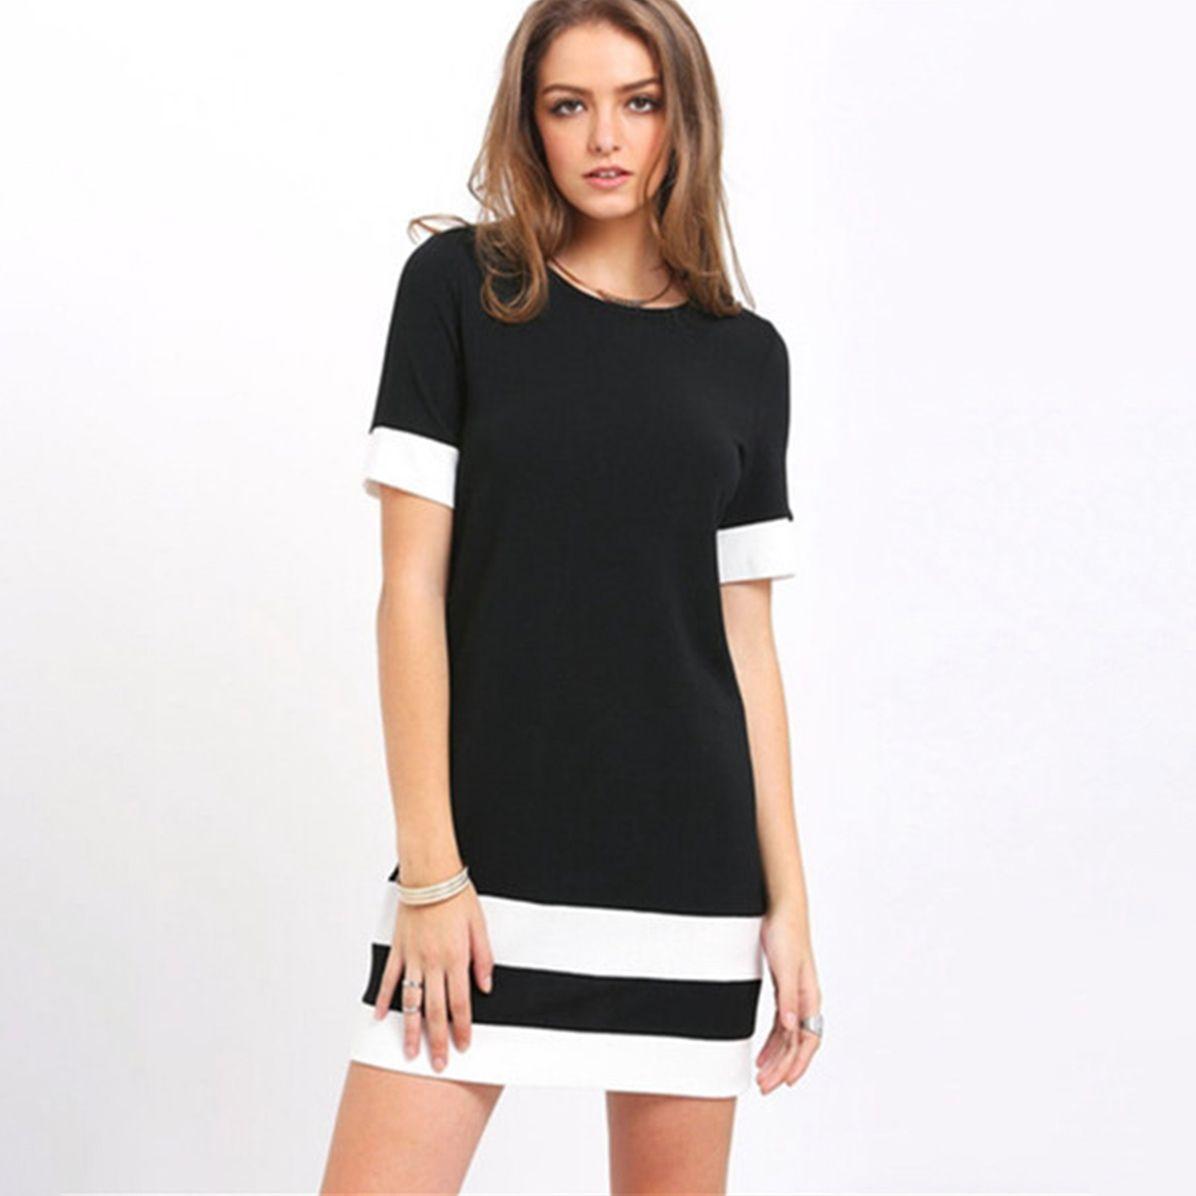 441009f08d2 Vintage Dress Women Summer Style Women Bodycon Dresses Sexy 2018 Casual  Black White Office Short Sleeve Mini Striped Dress Bridesmaid Dress Plus  Size Formal ...